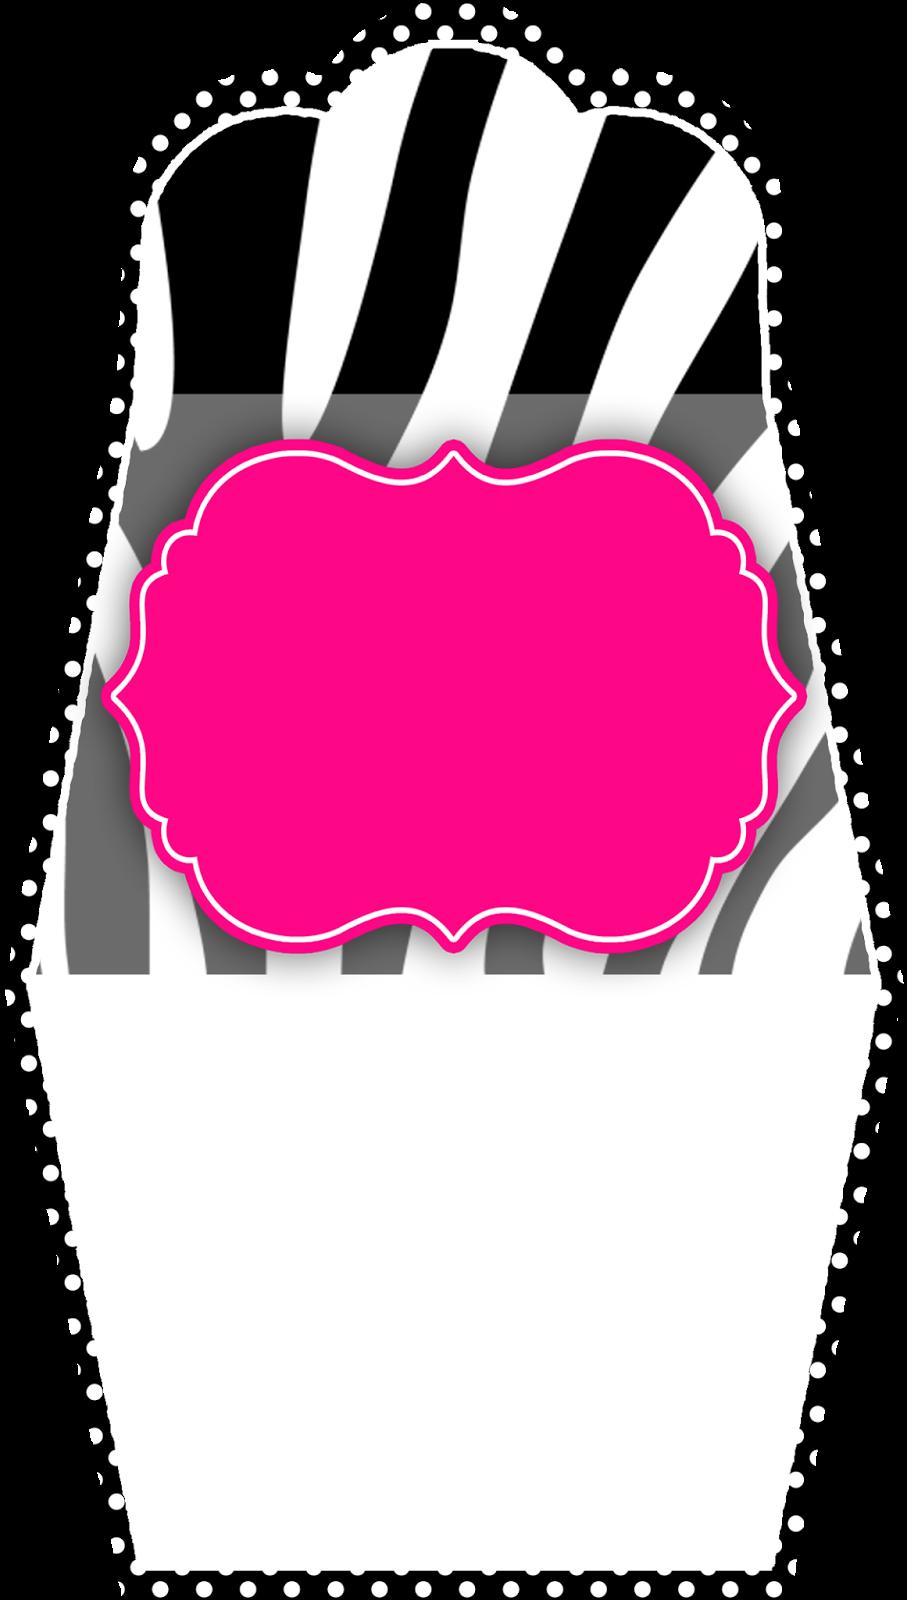 Montando minha festa: Zebra rosa e preto | Aniversario Adulto ...